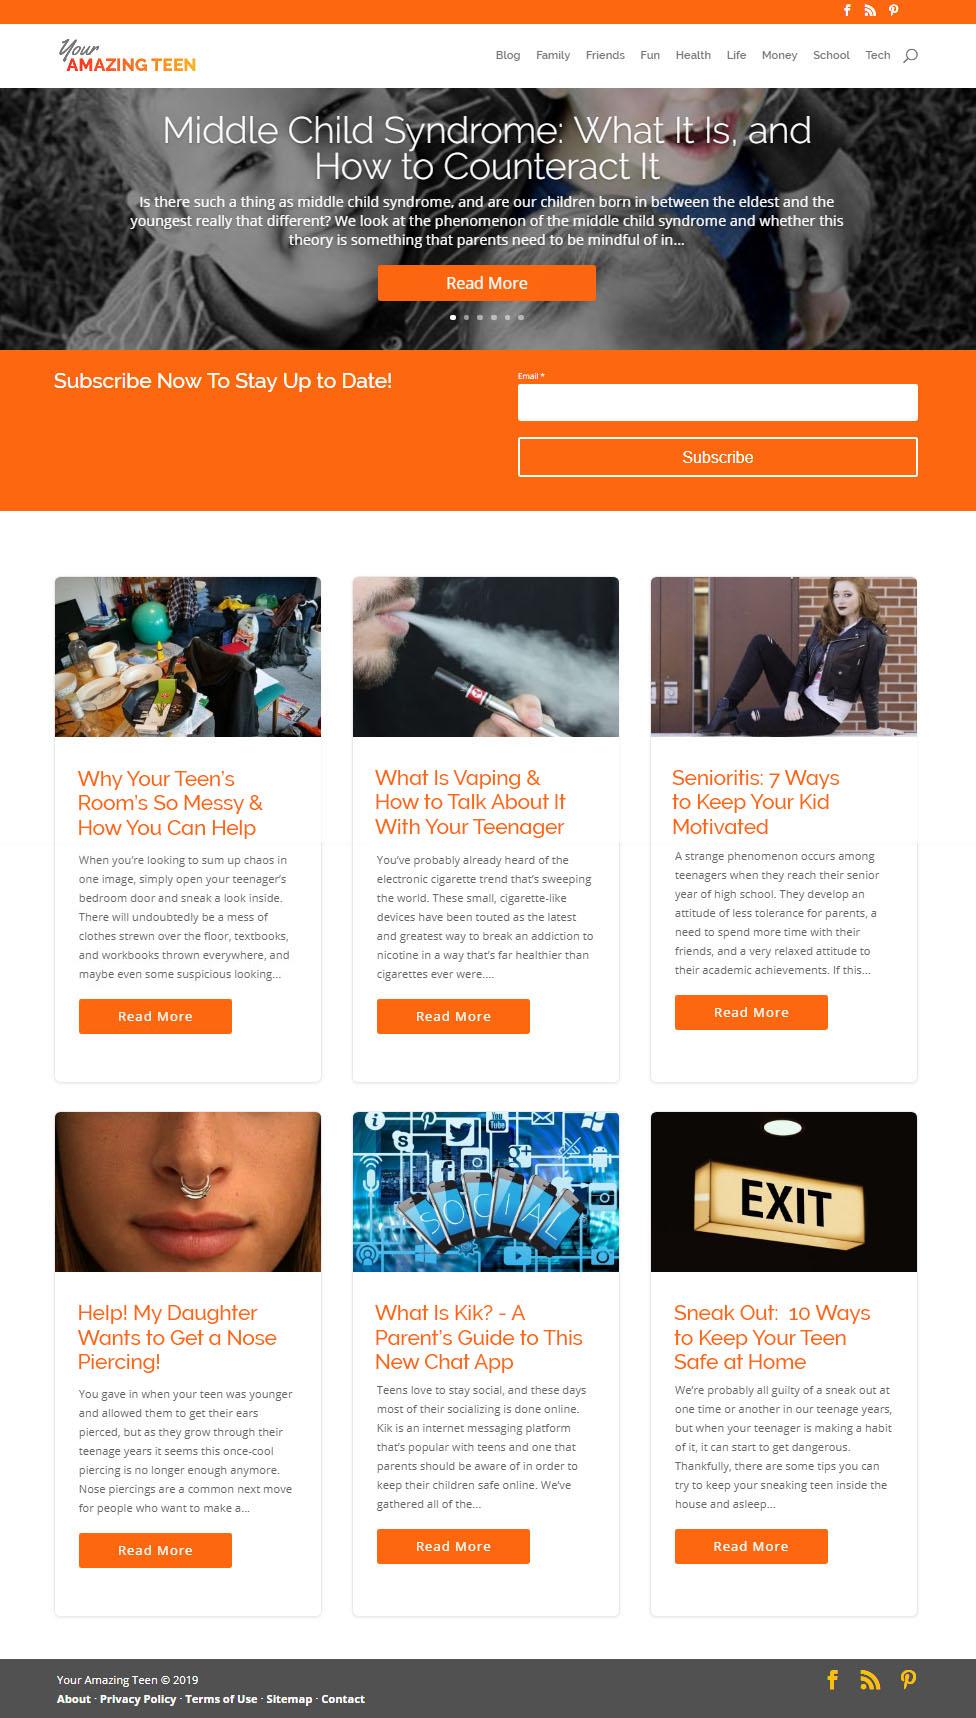 2018 - Your Amazing Teen website - Elisabeth Parker's portfolio.